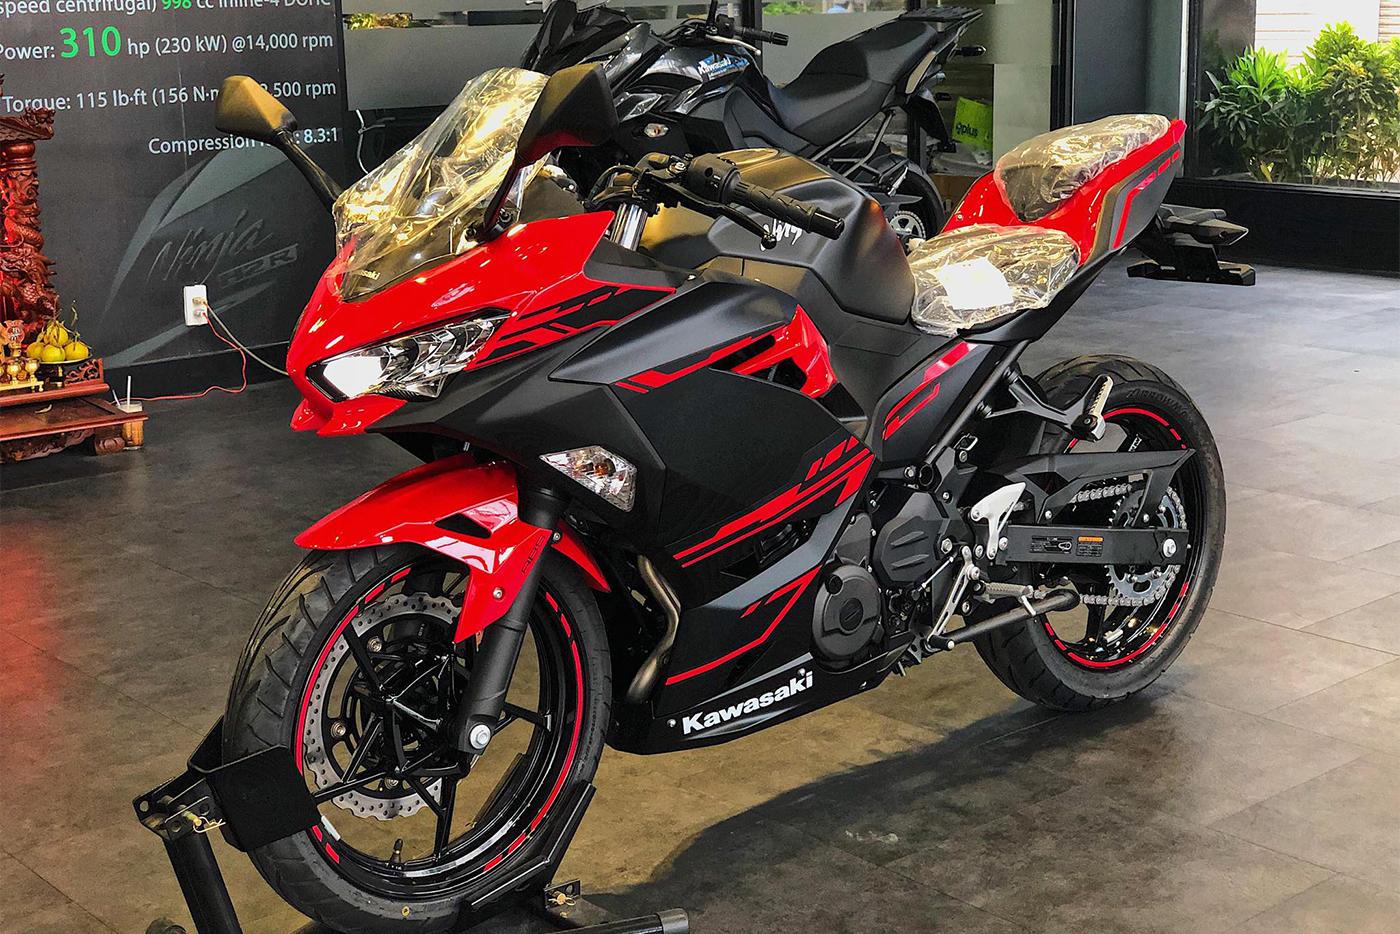 Chọn Kawasaki Ninja 250 2018 Honda CBR250RR 2018?